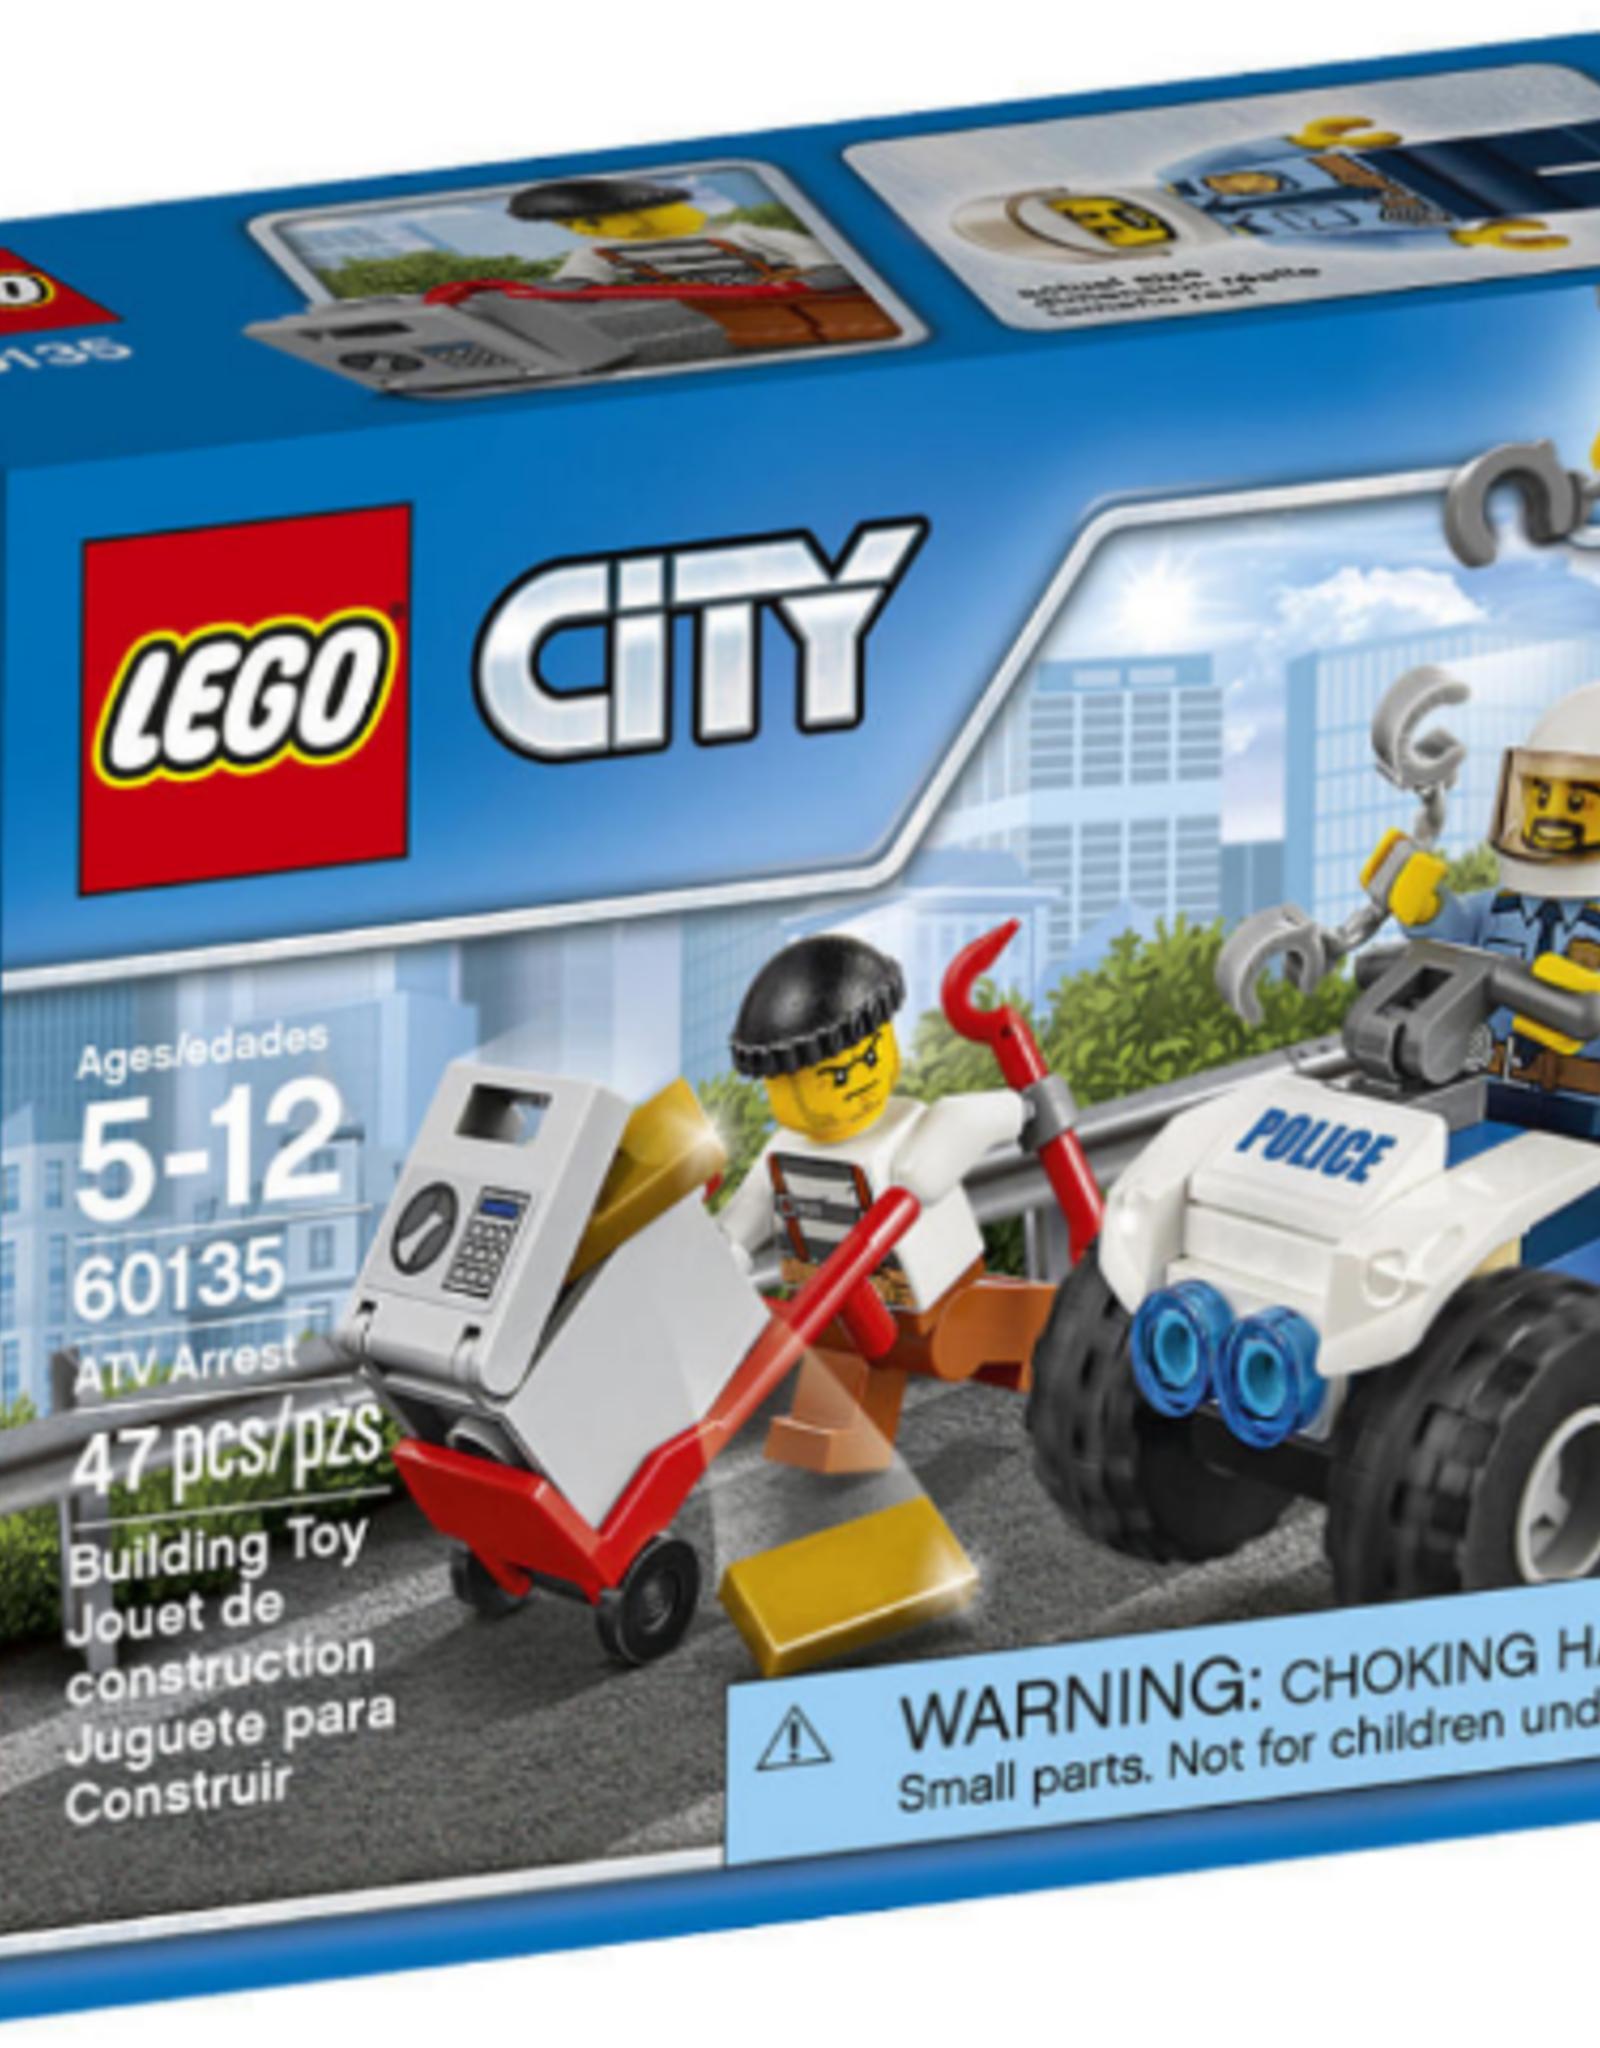 LEGO LEGO 60135 ATV Arrest CITY